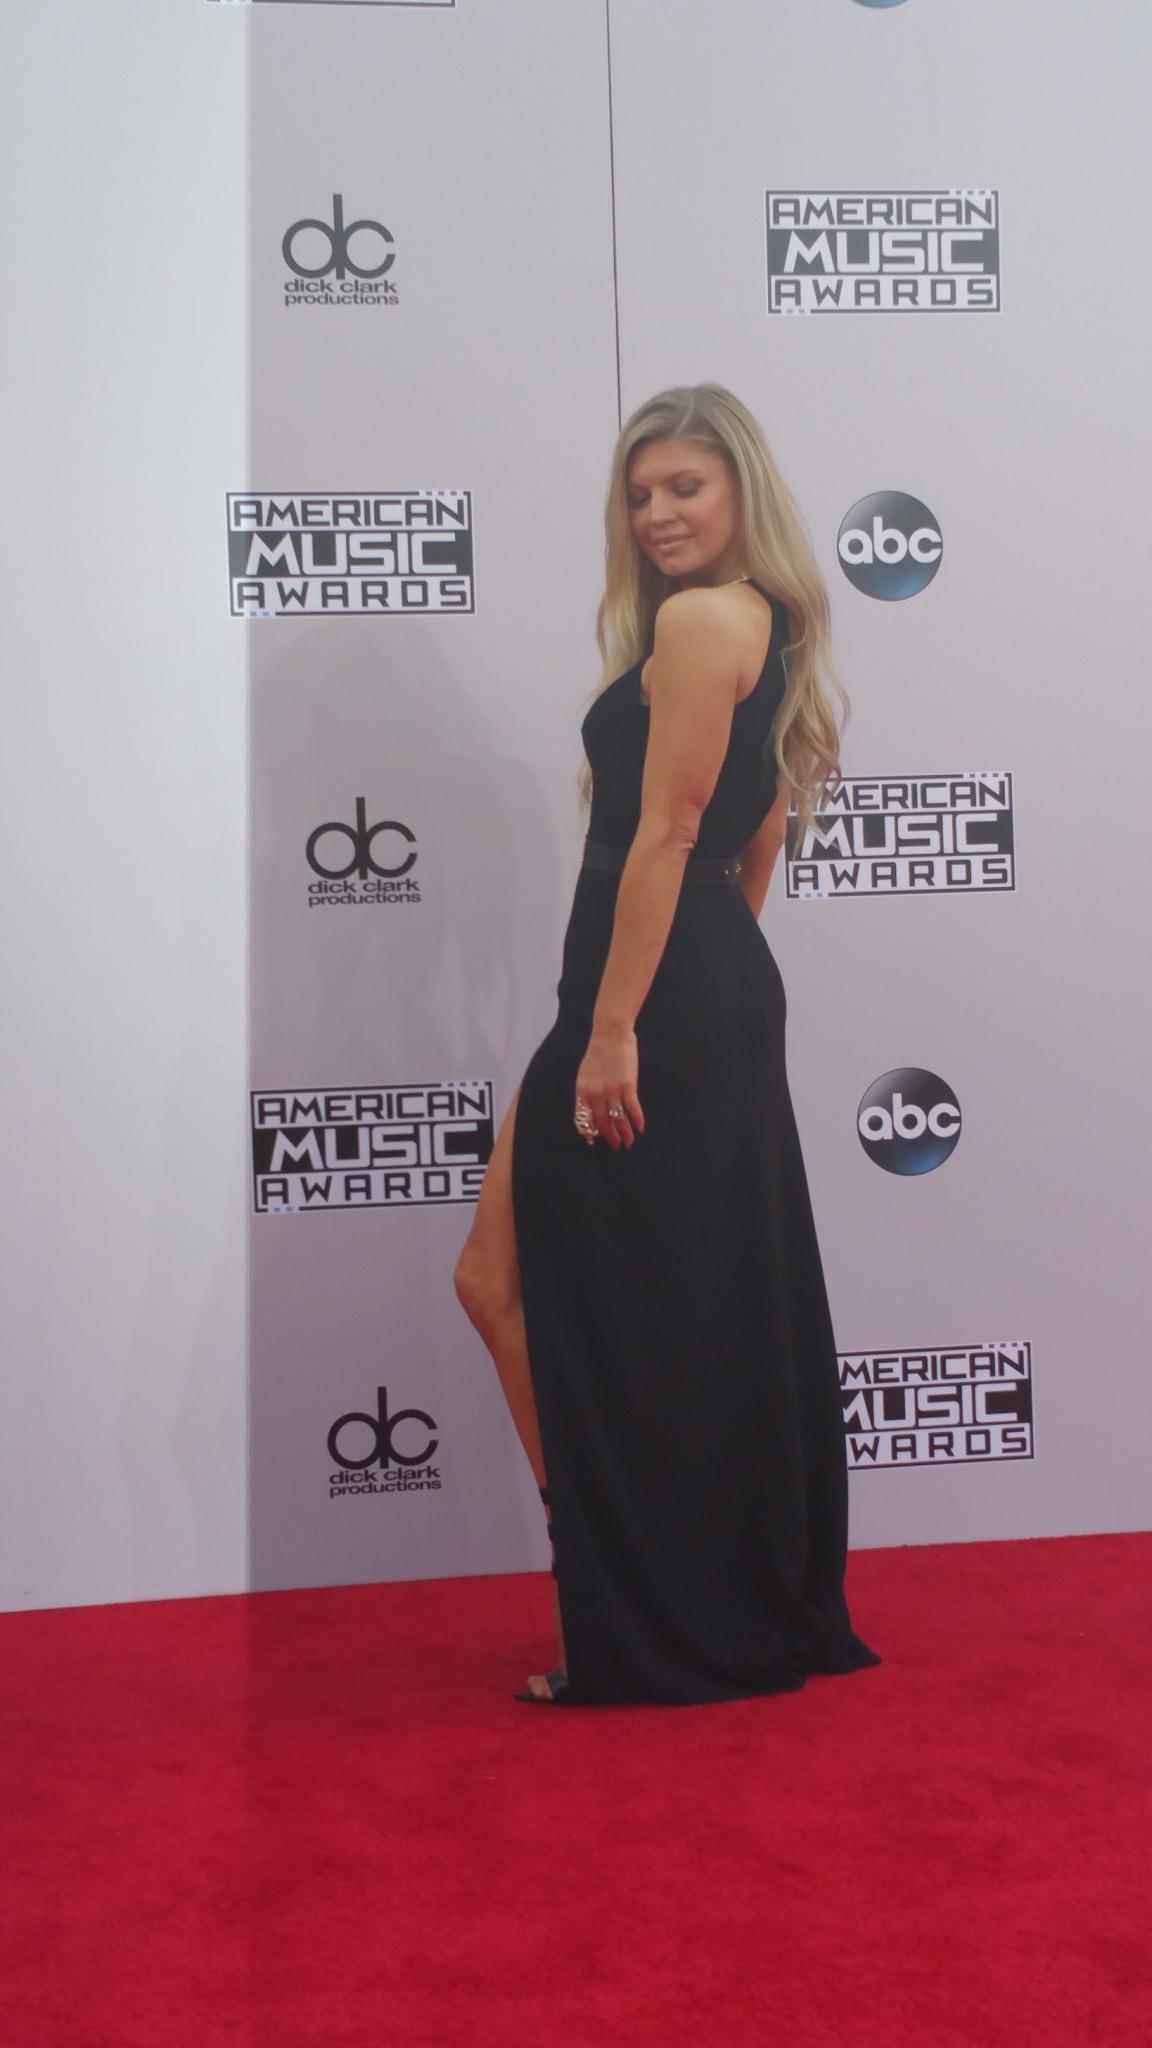 RT @TheAMAs: La-La-LOVE @Fergie's fab-fab-FABULOUS red carpet dress! Fergalicious indeed! #AMAs #LALOVE http://t.co/I1t1oSPP9O